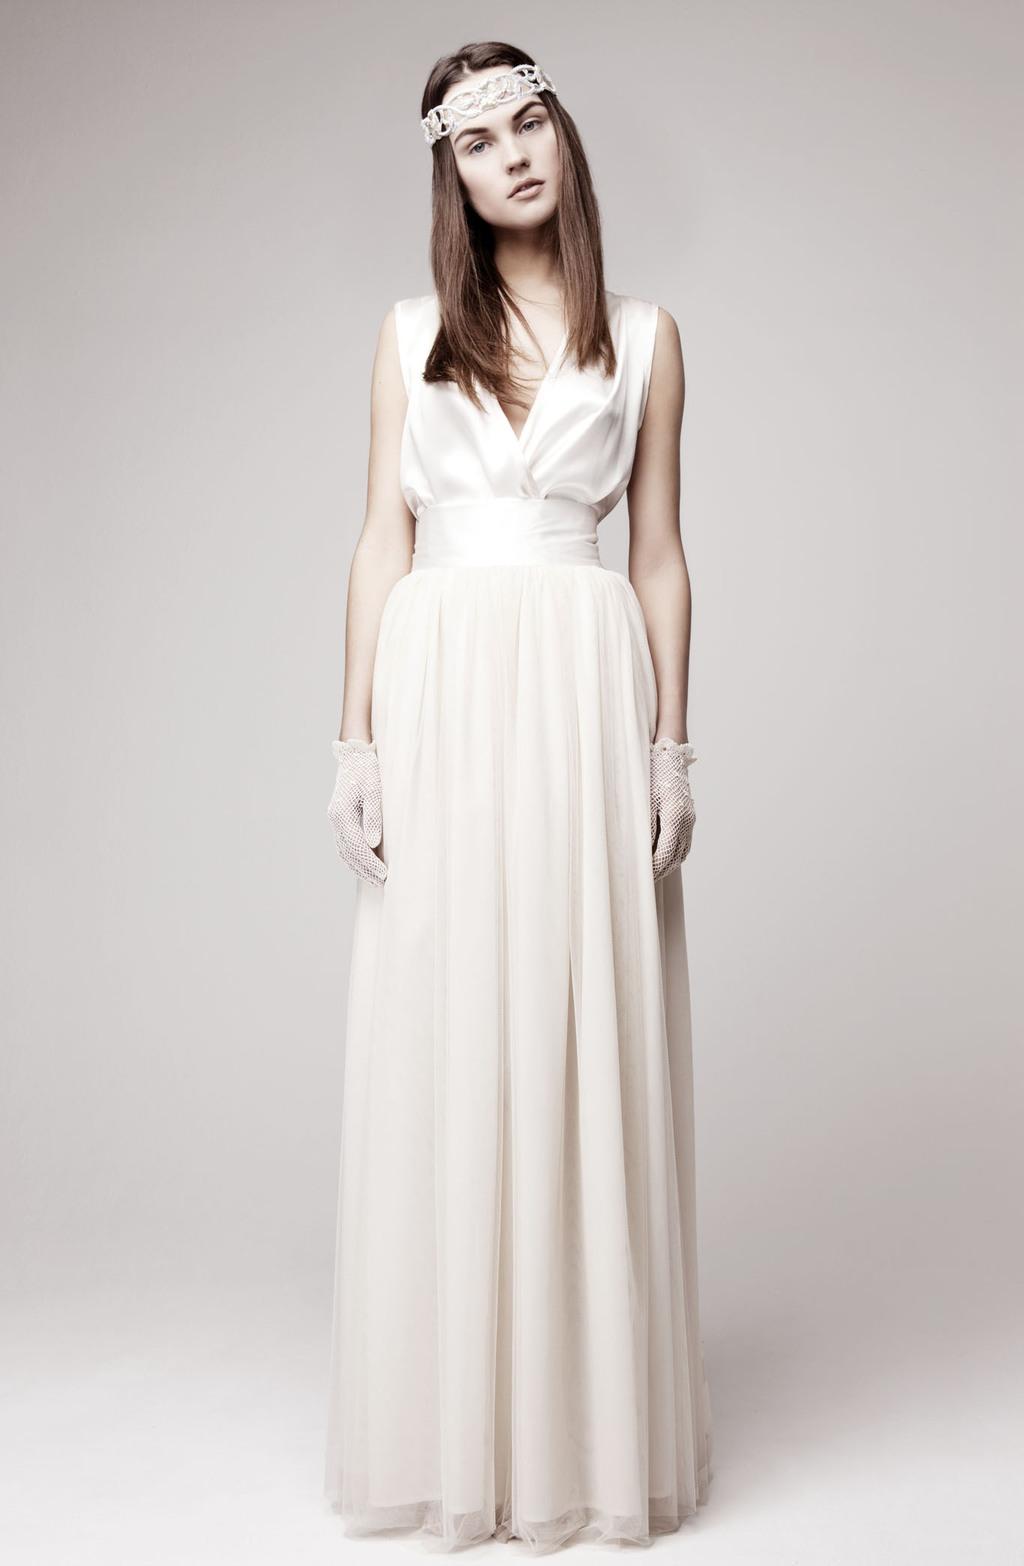 Simple-wedding-dress-for-vintage-or-modern-brides-3.full